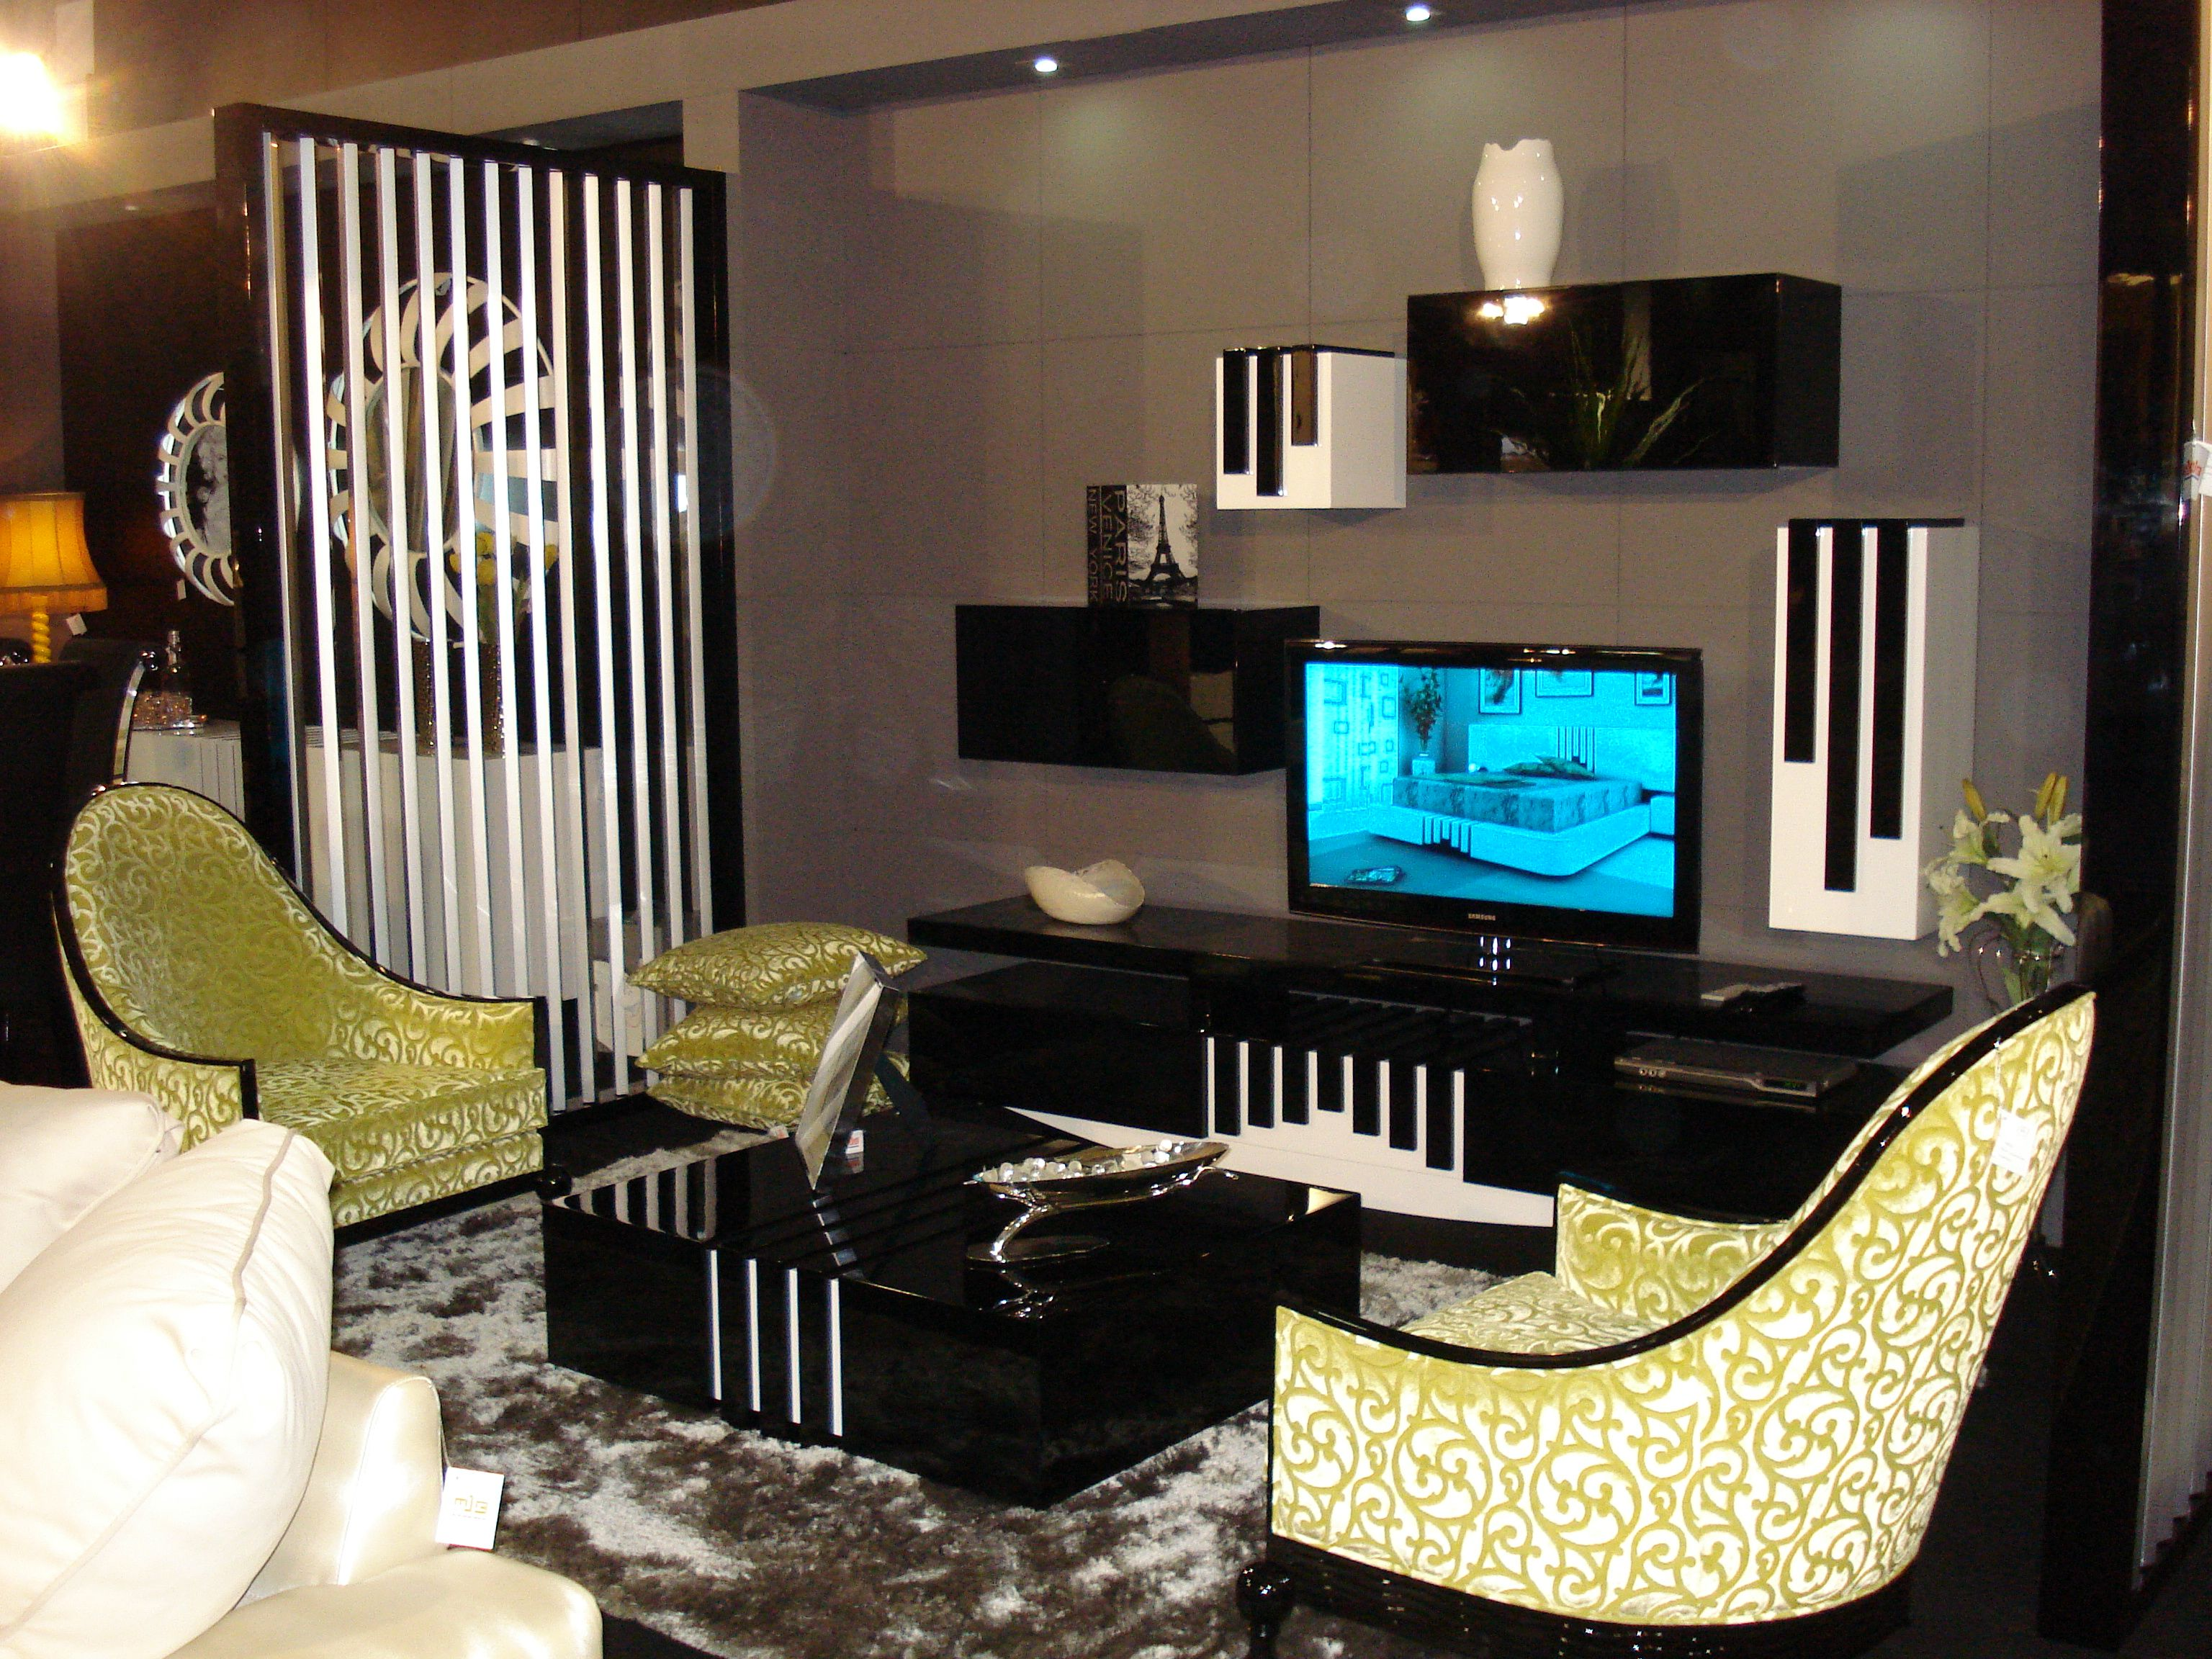 Vector Collection | Prime Design Furniture #primedesign #vectorcollection #luxuryfurniture #luxuryhomes #designtailors #trends2015 #design #diningroom #luxury #maisonobjet